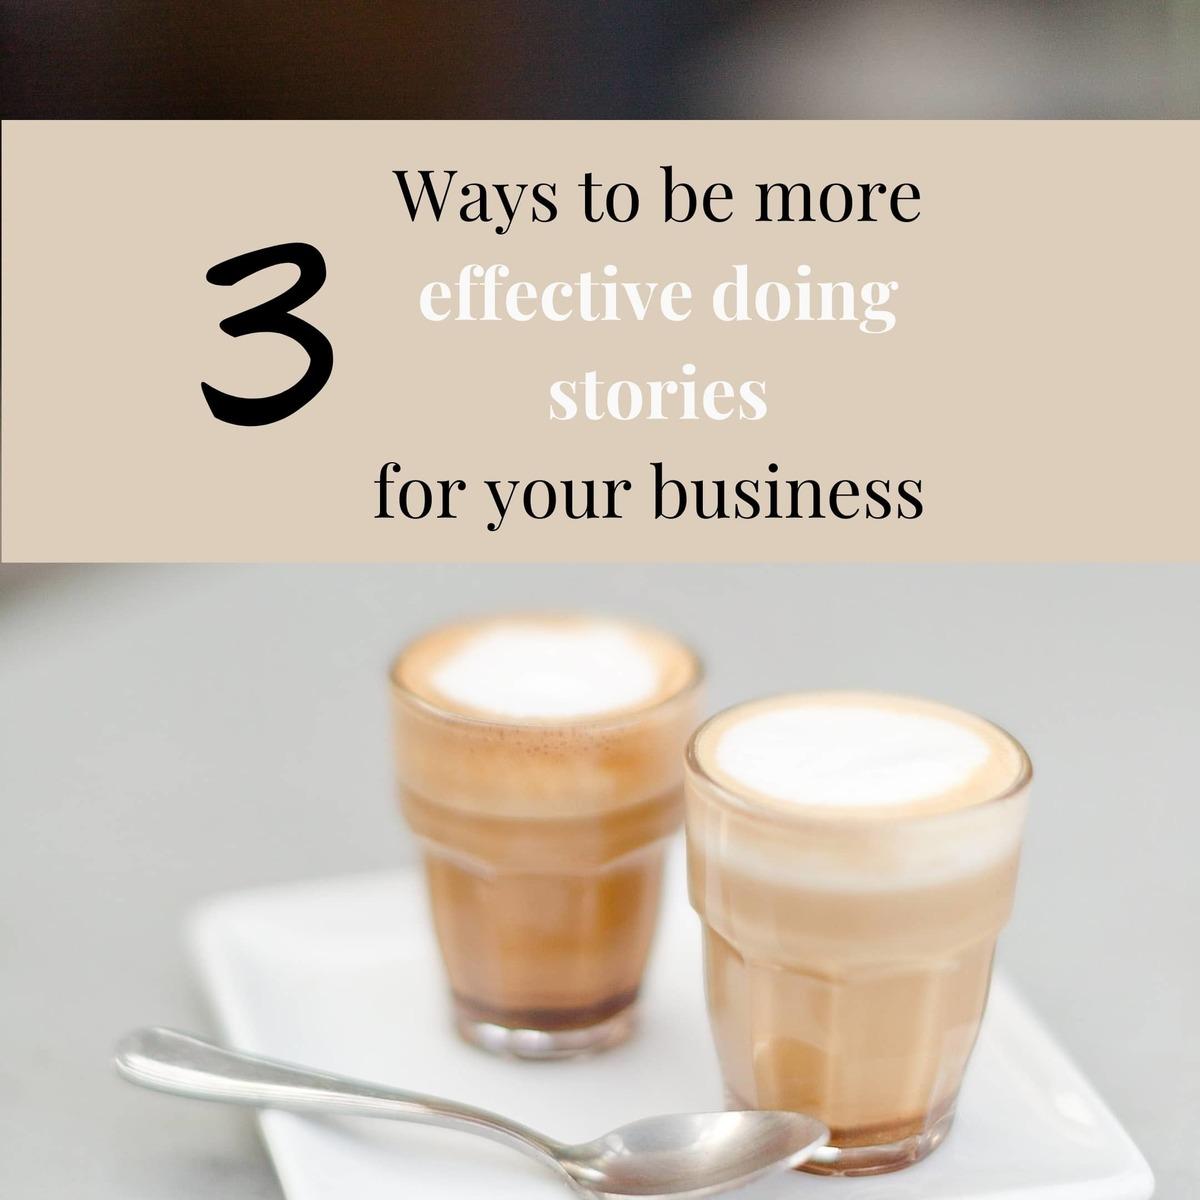 Imagem capa - 3 ways to be more effective doing stories for your business por Joanna Pantigoso